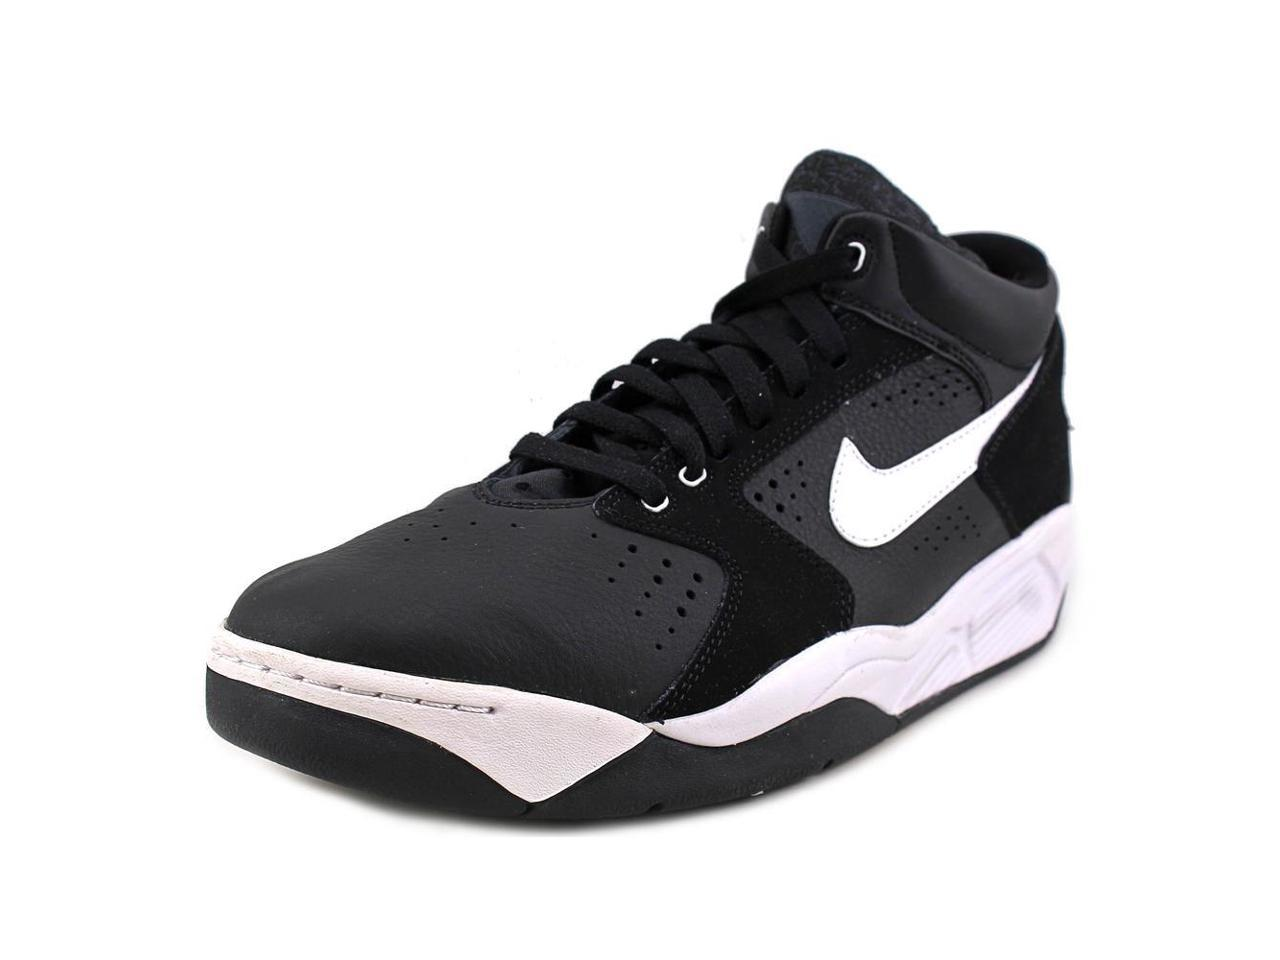 Nike Flight Lite '15 Men Sneakers US 9 Black Sneakers Men 67495b